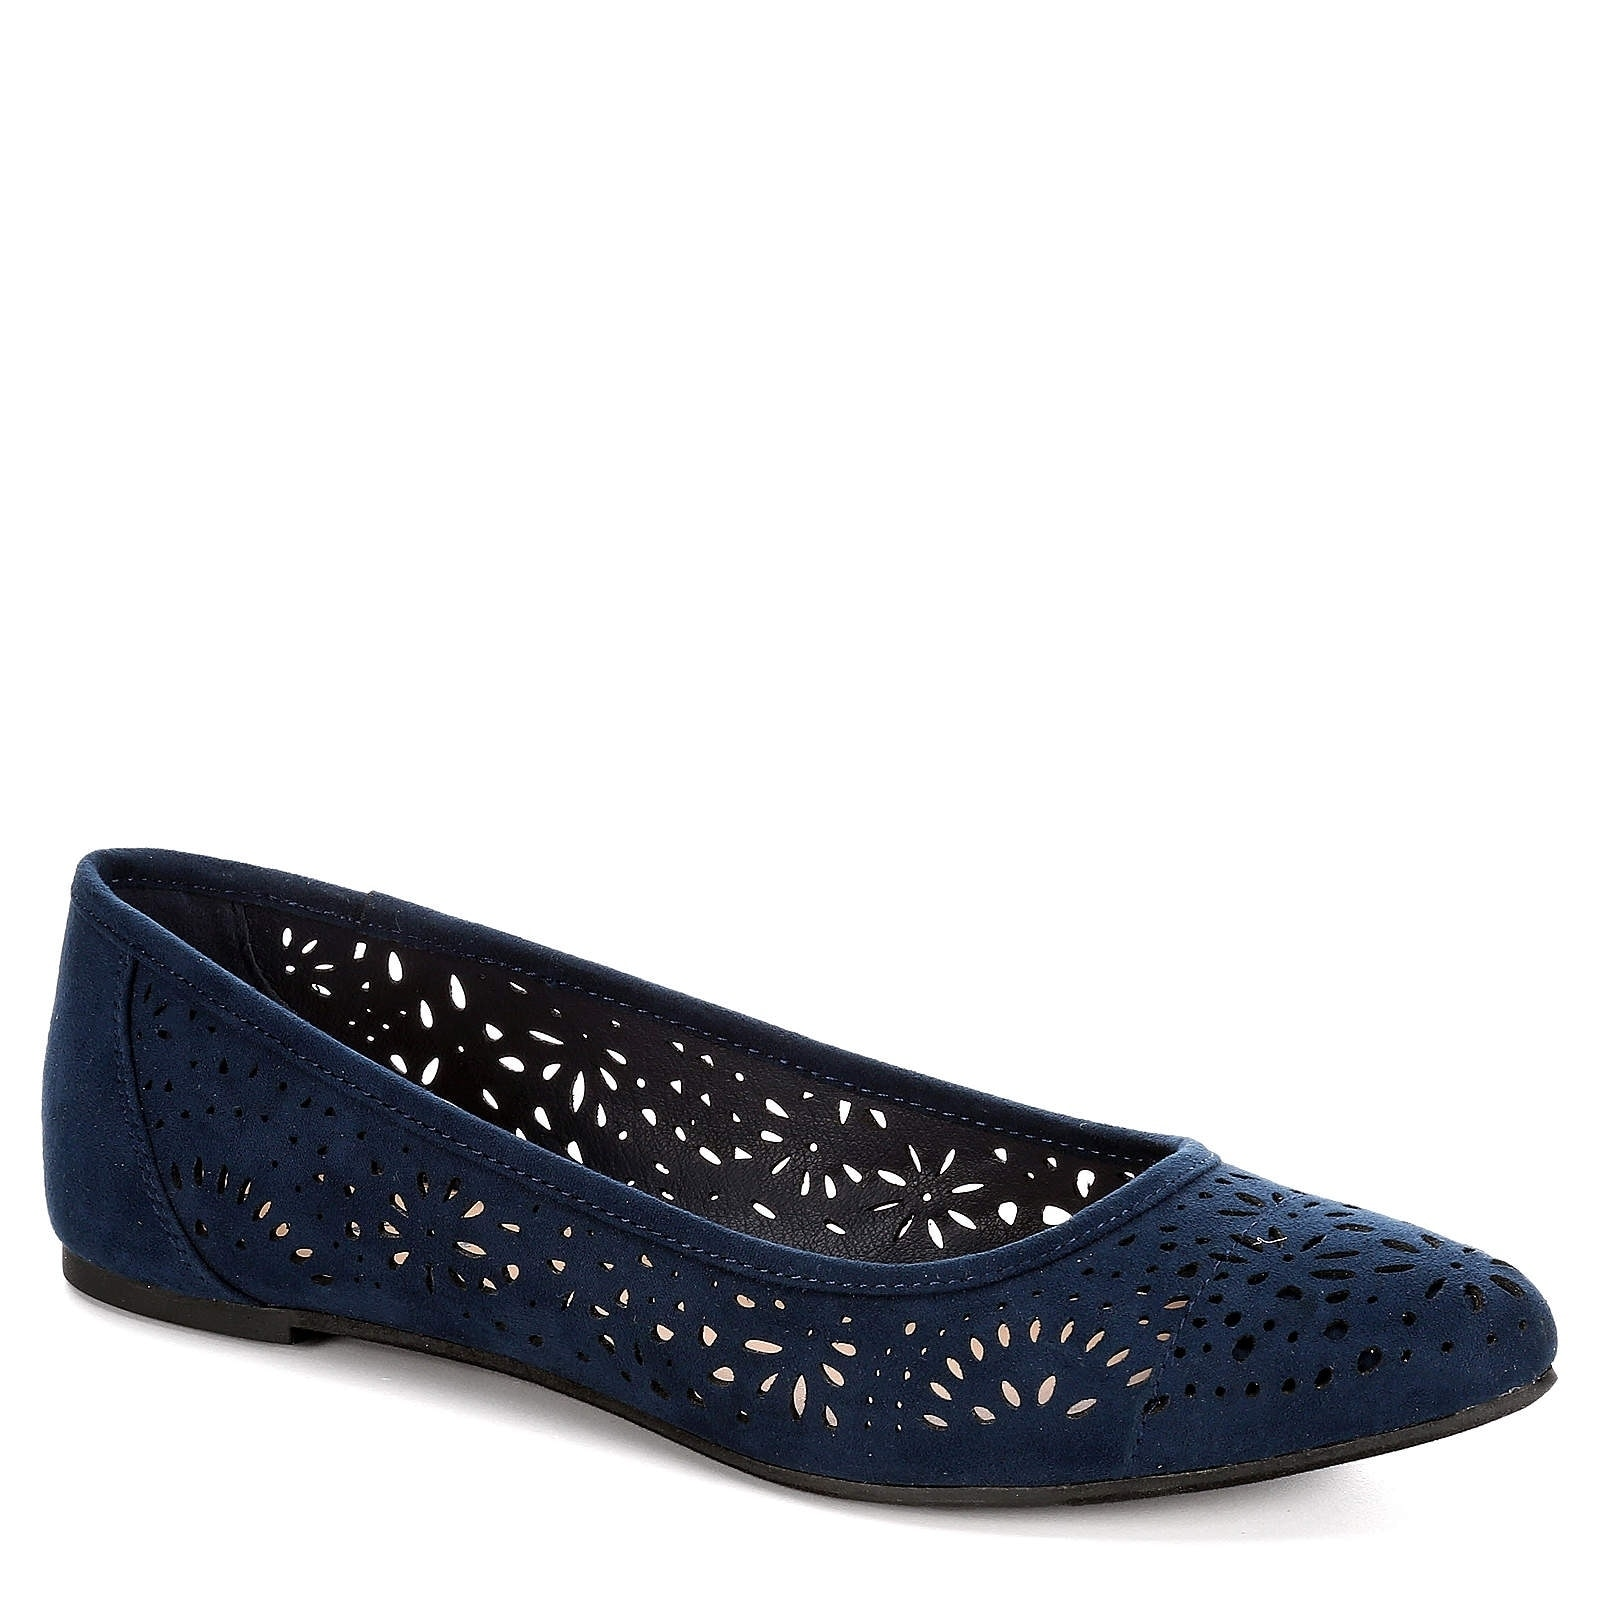 XAPPEAL Womens Adilene Perforated Slip